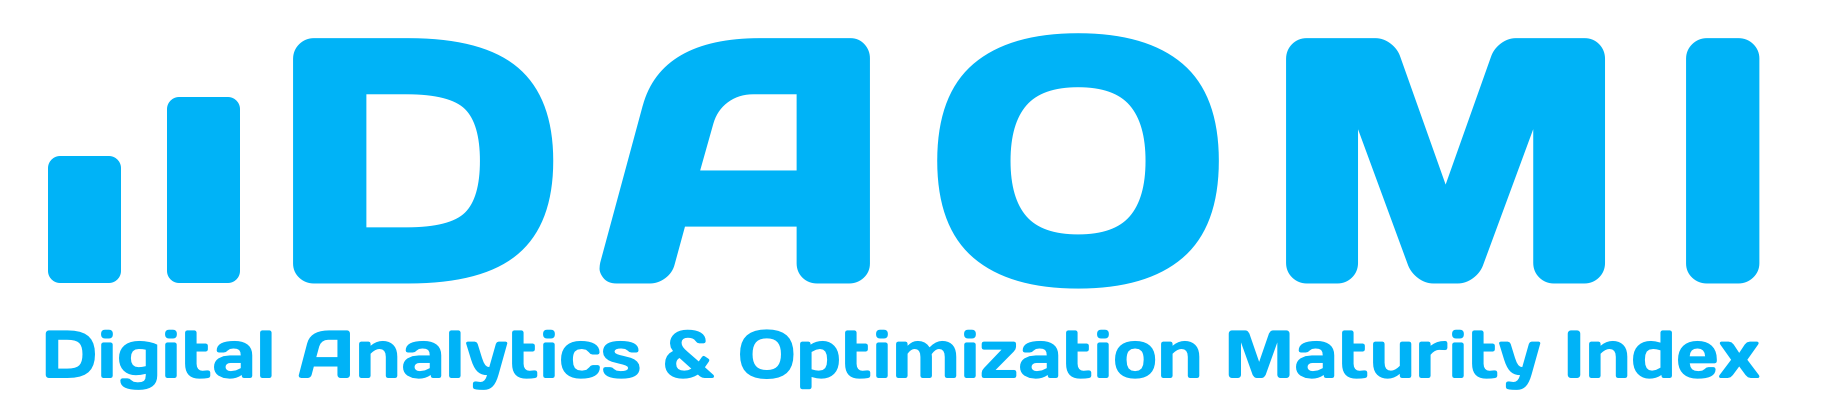 Digital Analytics & Optimization Maturity Index